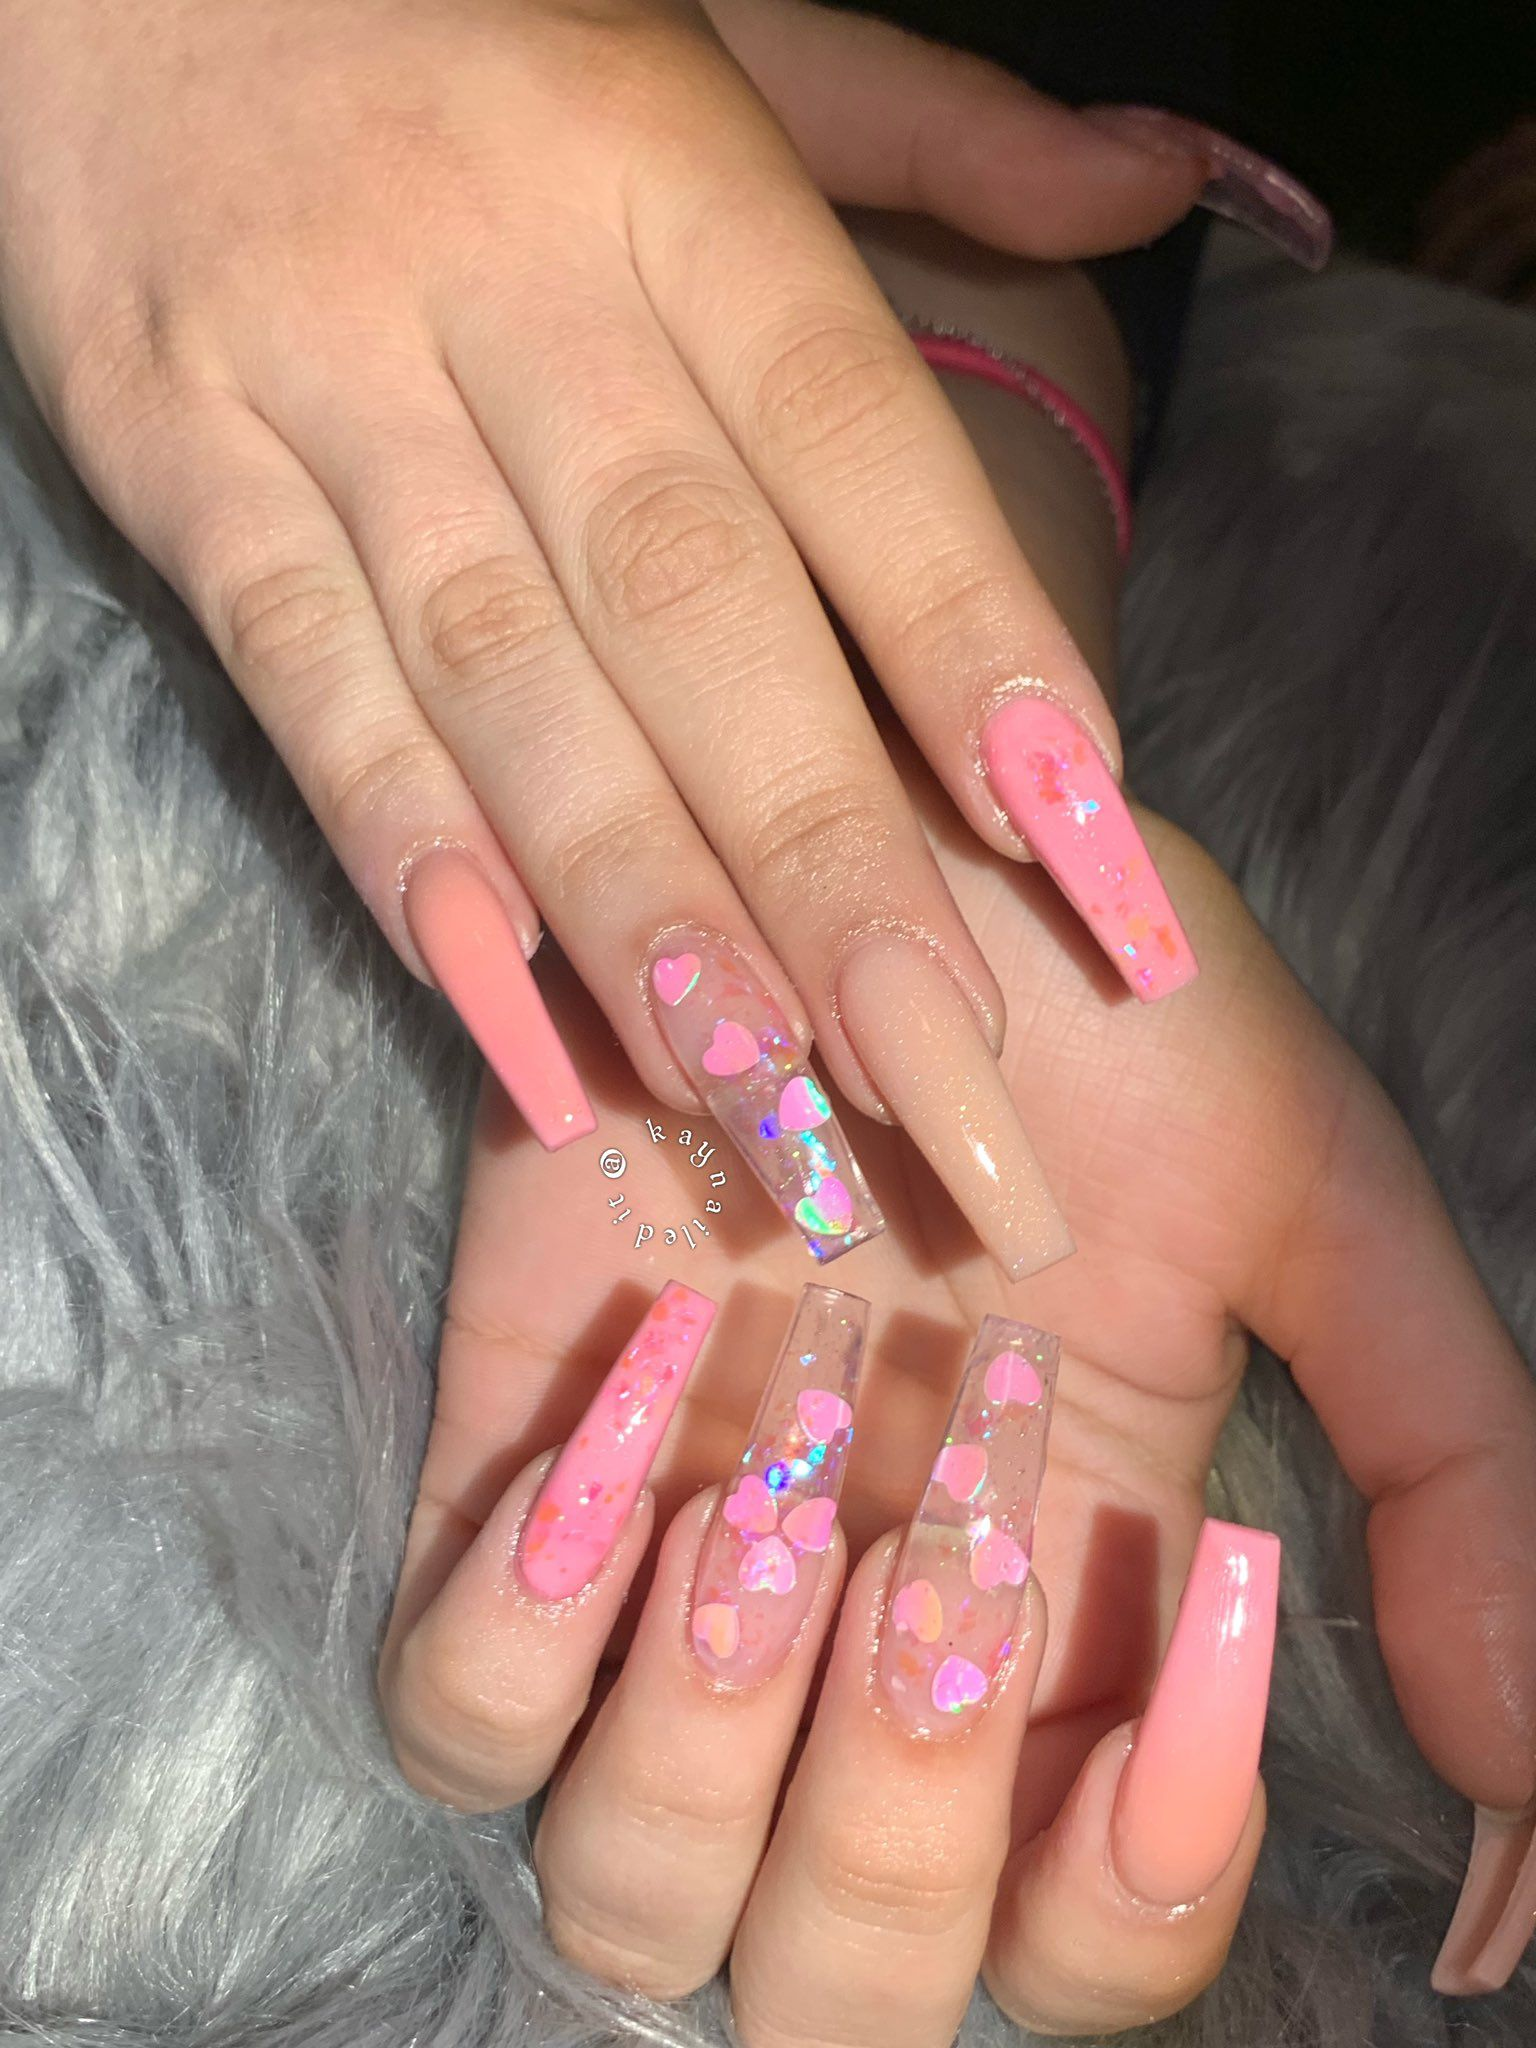 Kaytheenailtech On Twitter Pink Acrylic Nails Coffin Nails Designs Cute Acrylic Nails